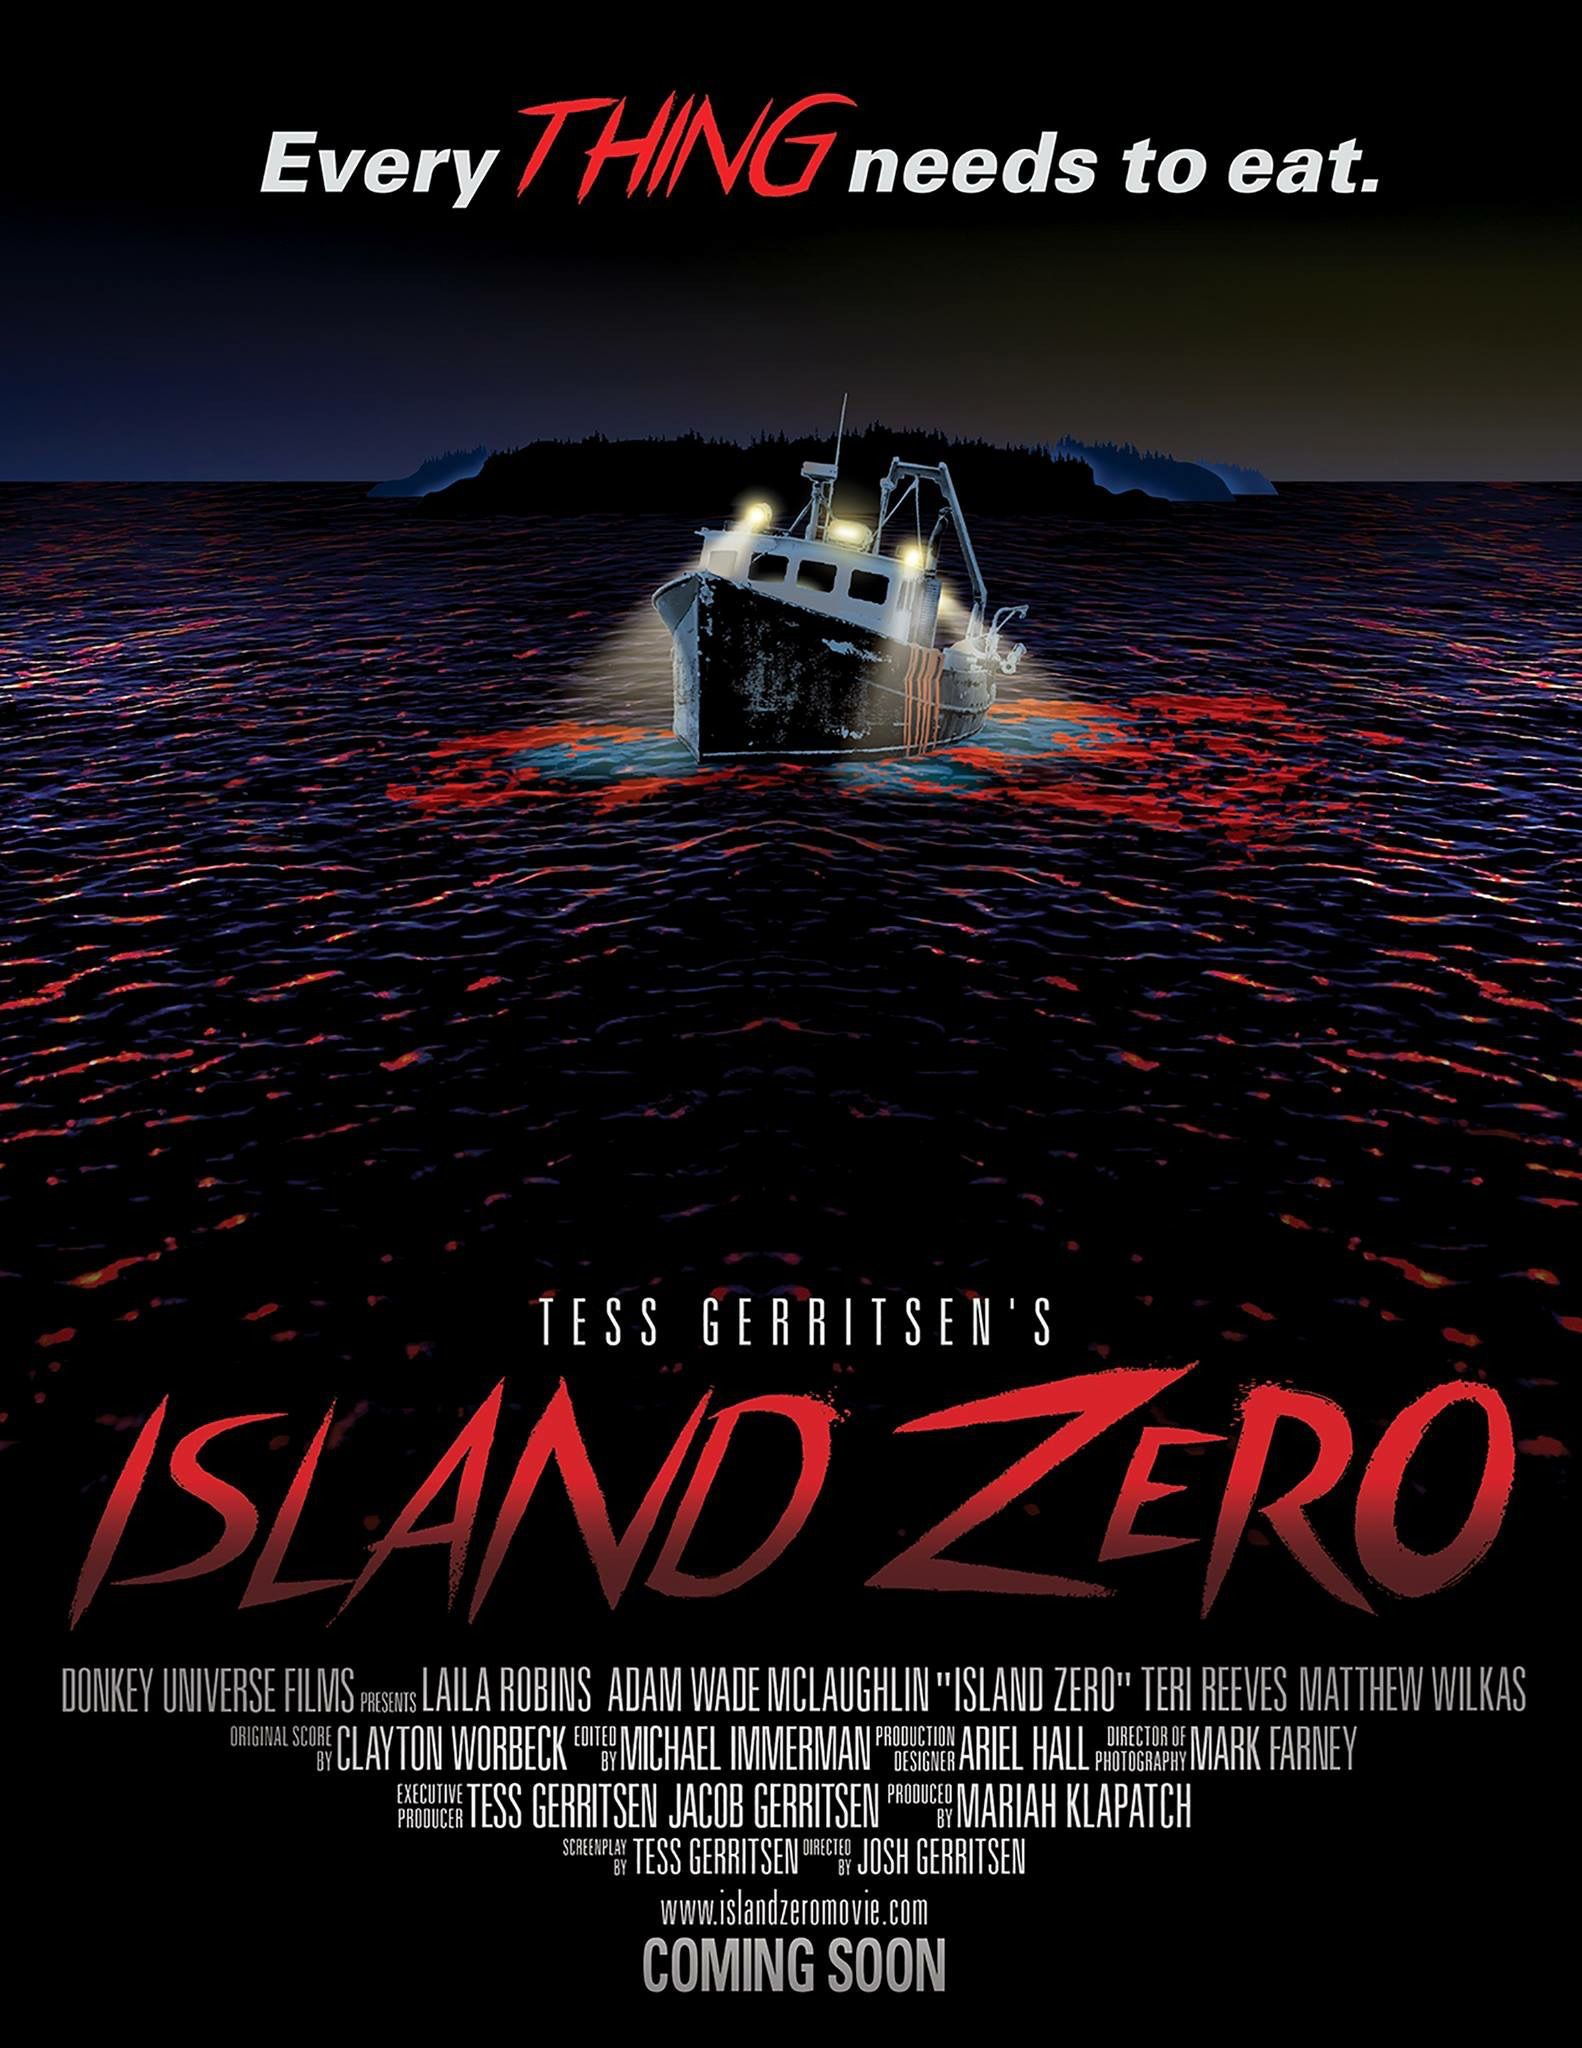 island zero movie poster design by muycreative com stuff i create